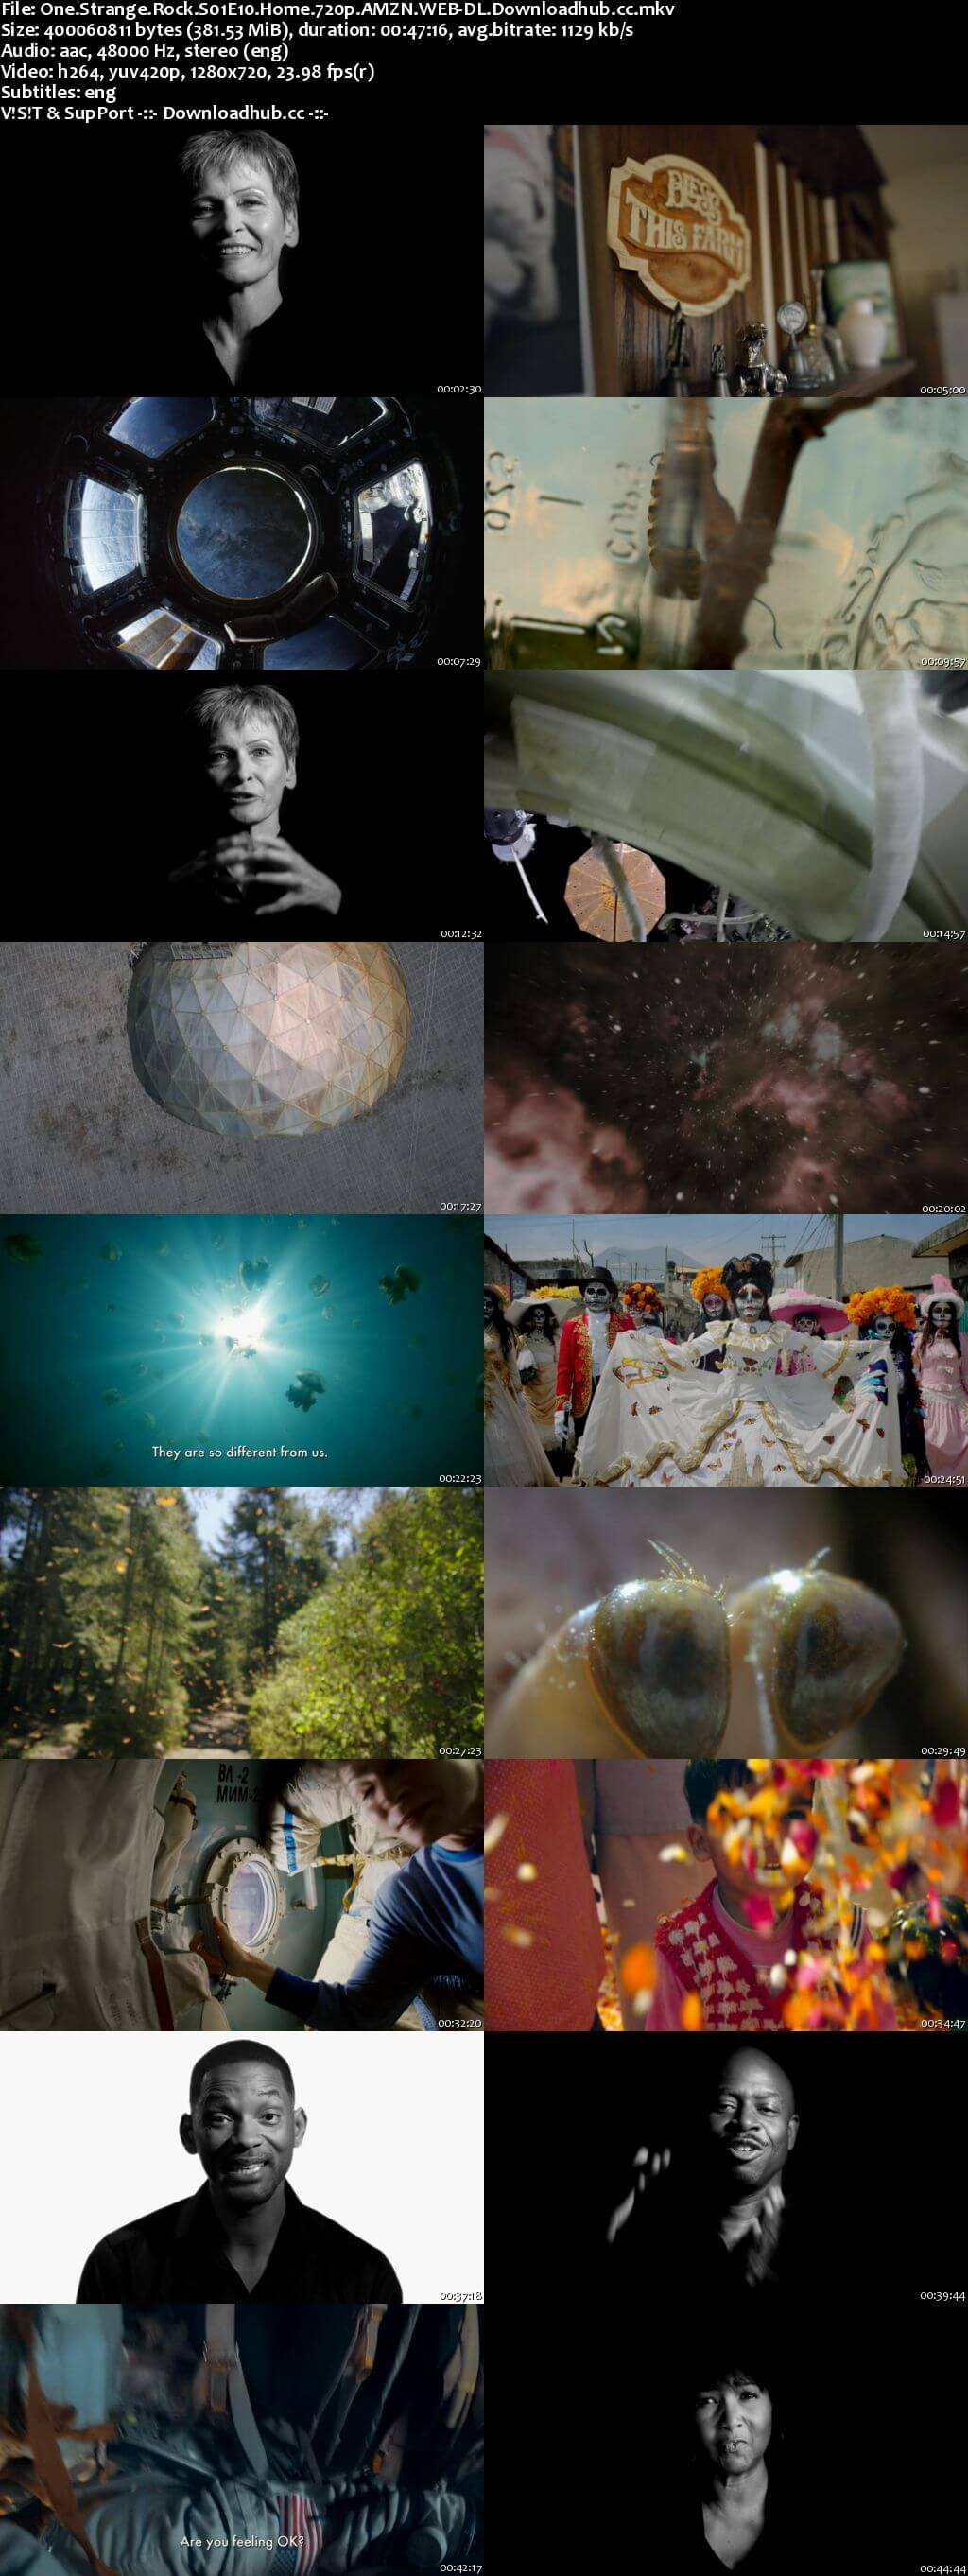 One Strange Rock S01E10 380MB WEBRip 720p x264